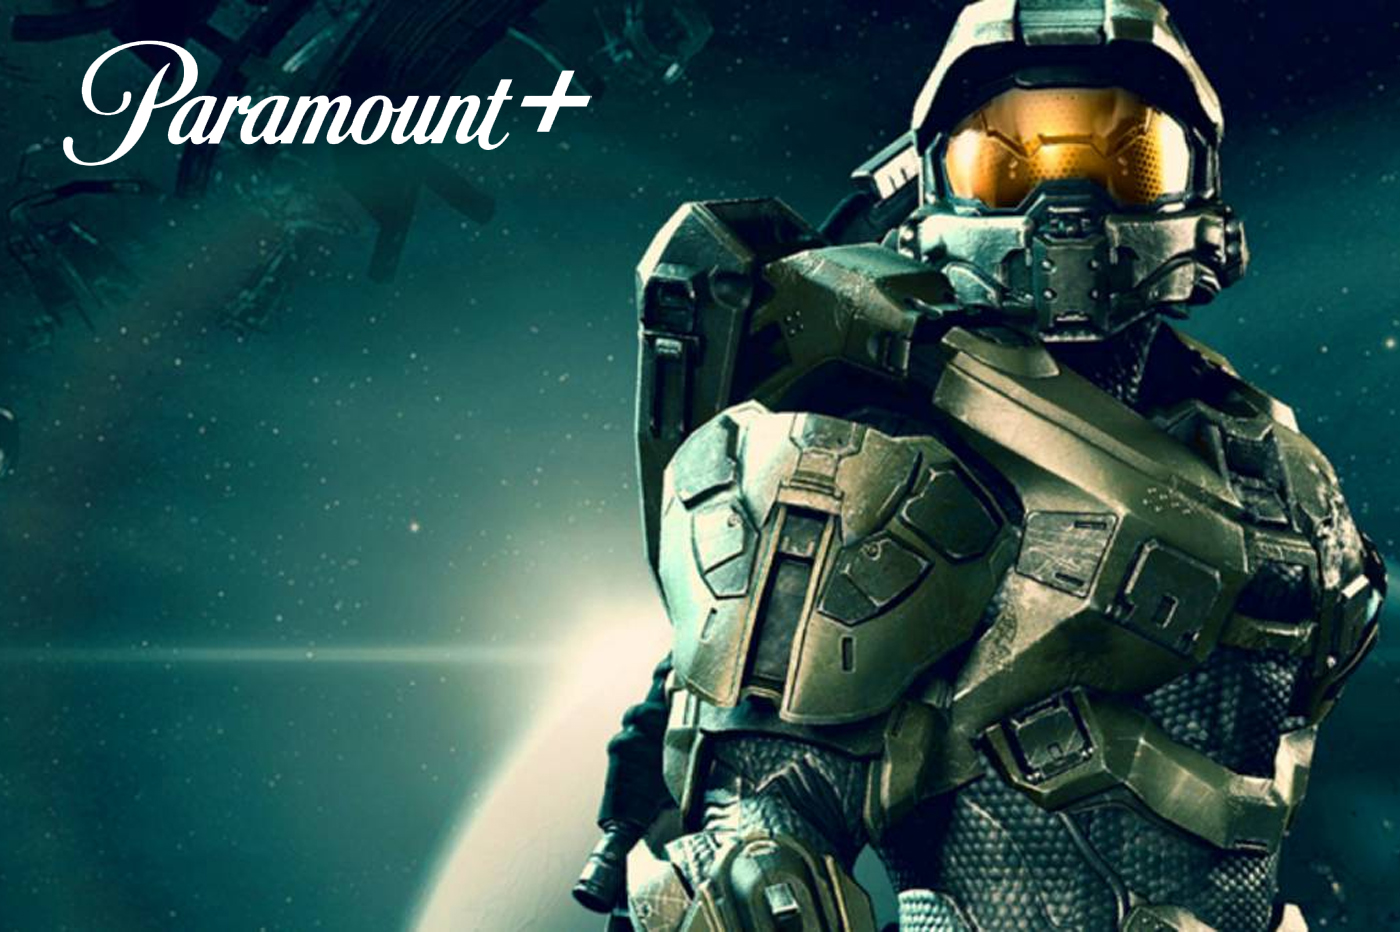 Halo Paramount+